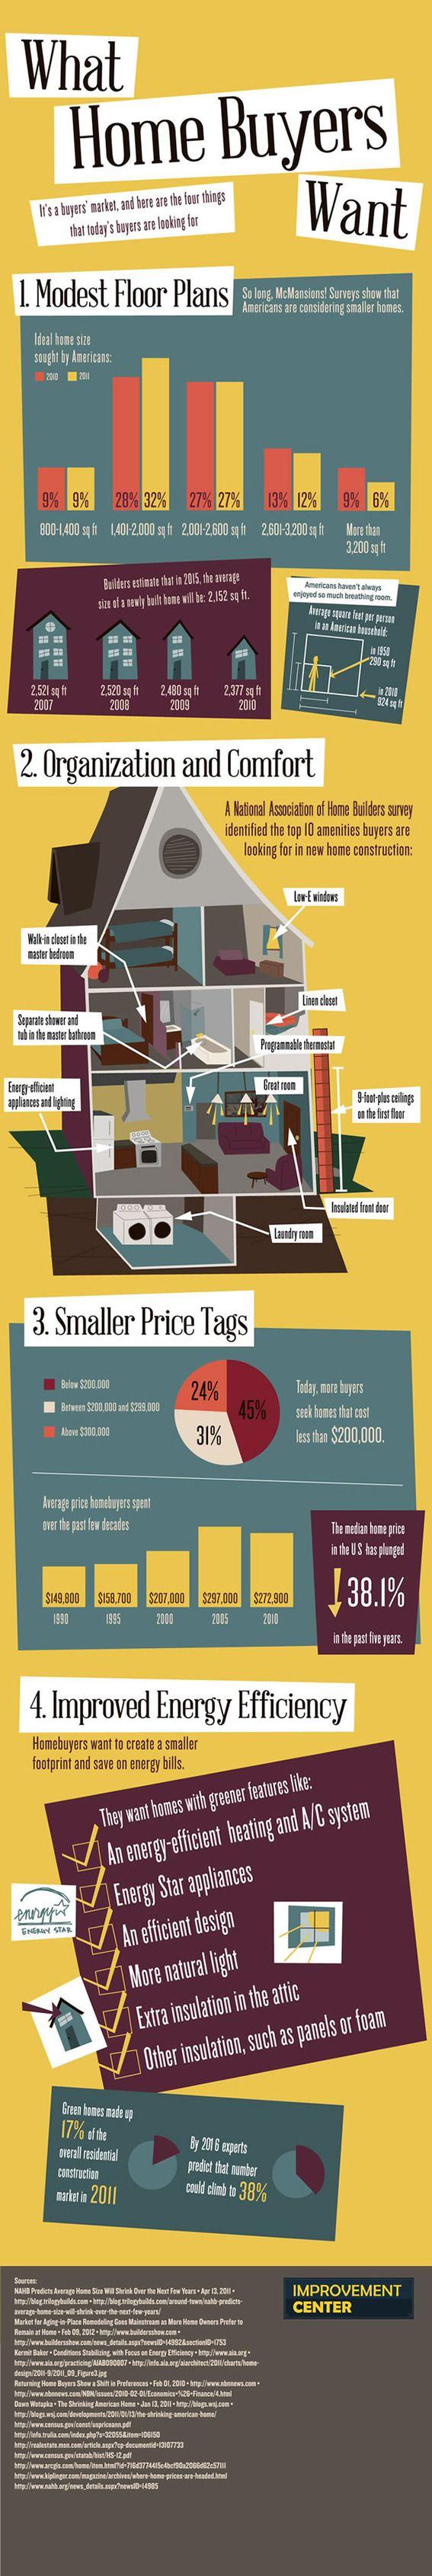 What Home Buyers Want! Select Milwaukee can help you achieve Homeownership. www.selectmilwaukee.org